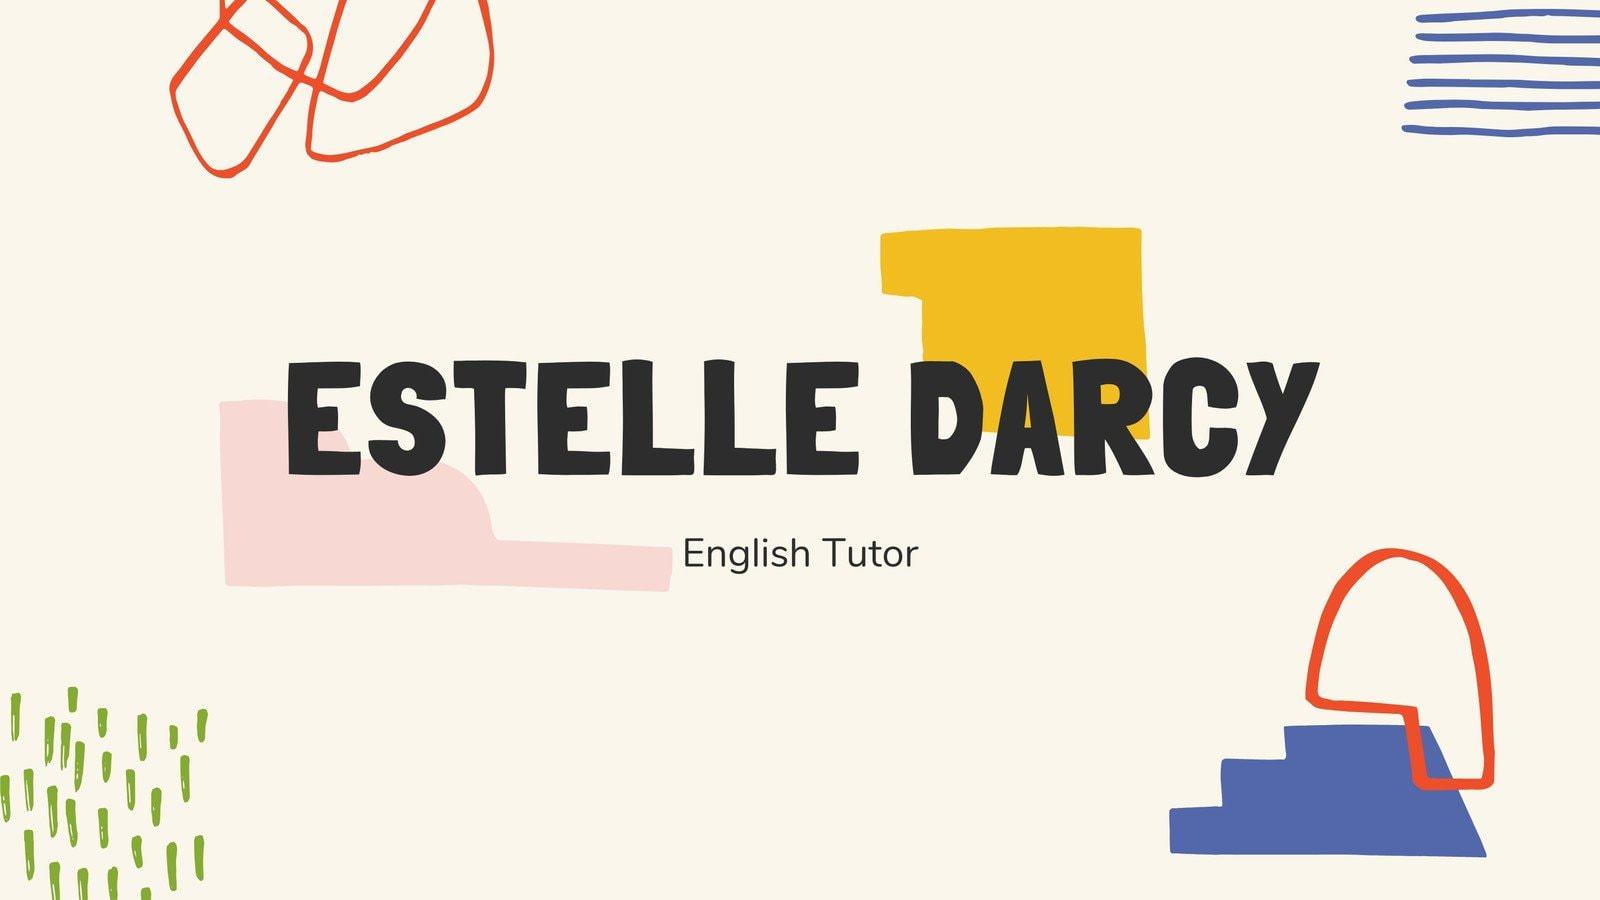 Colorful Hand-Drawn English Tutor Marketing Presentation